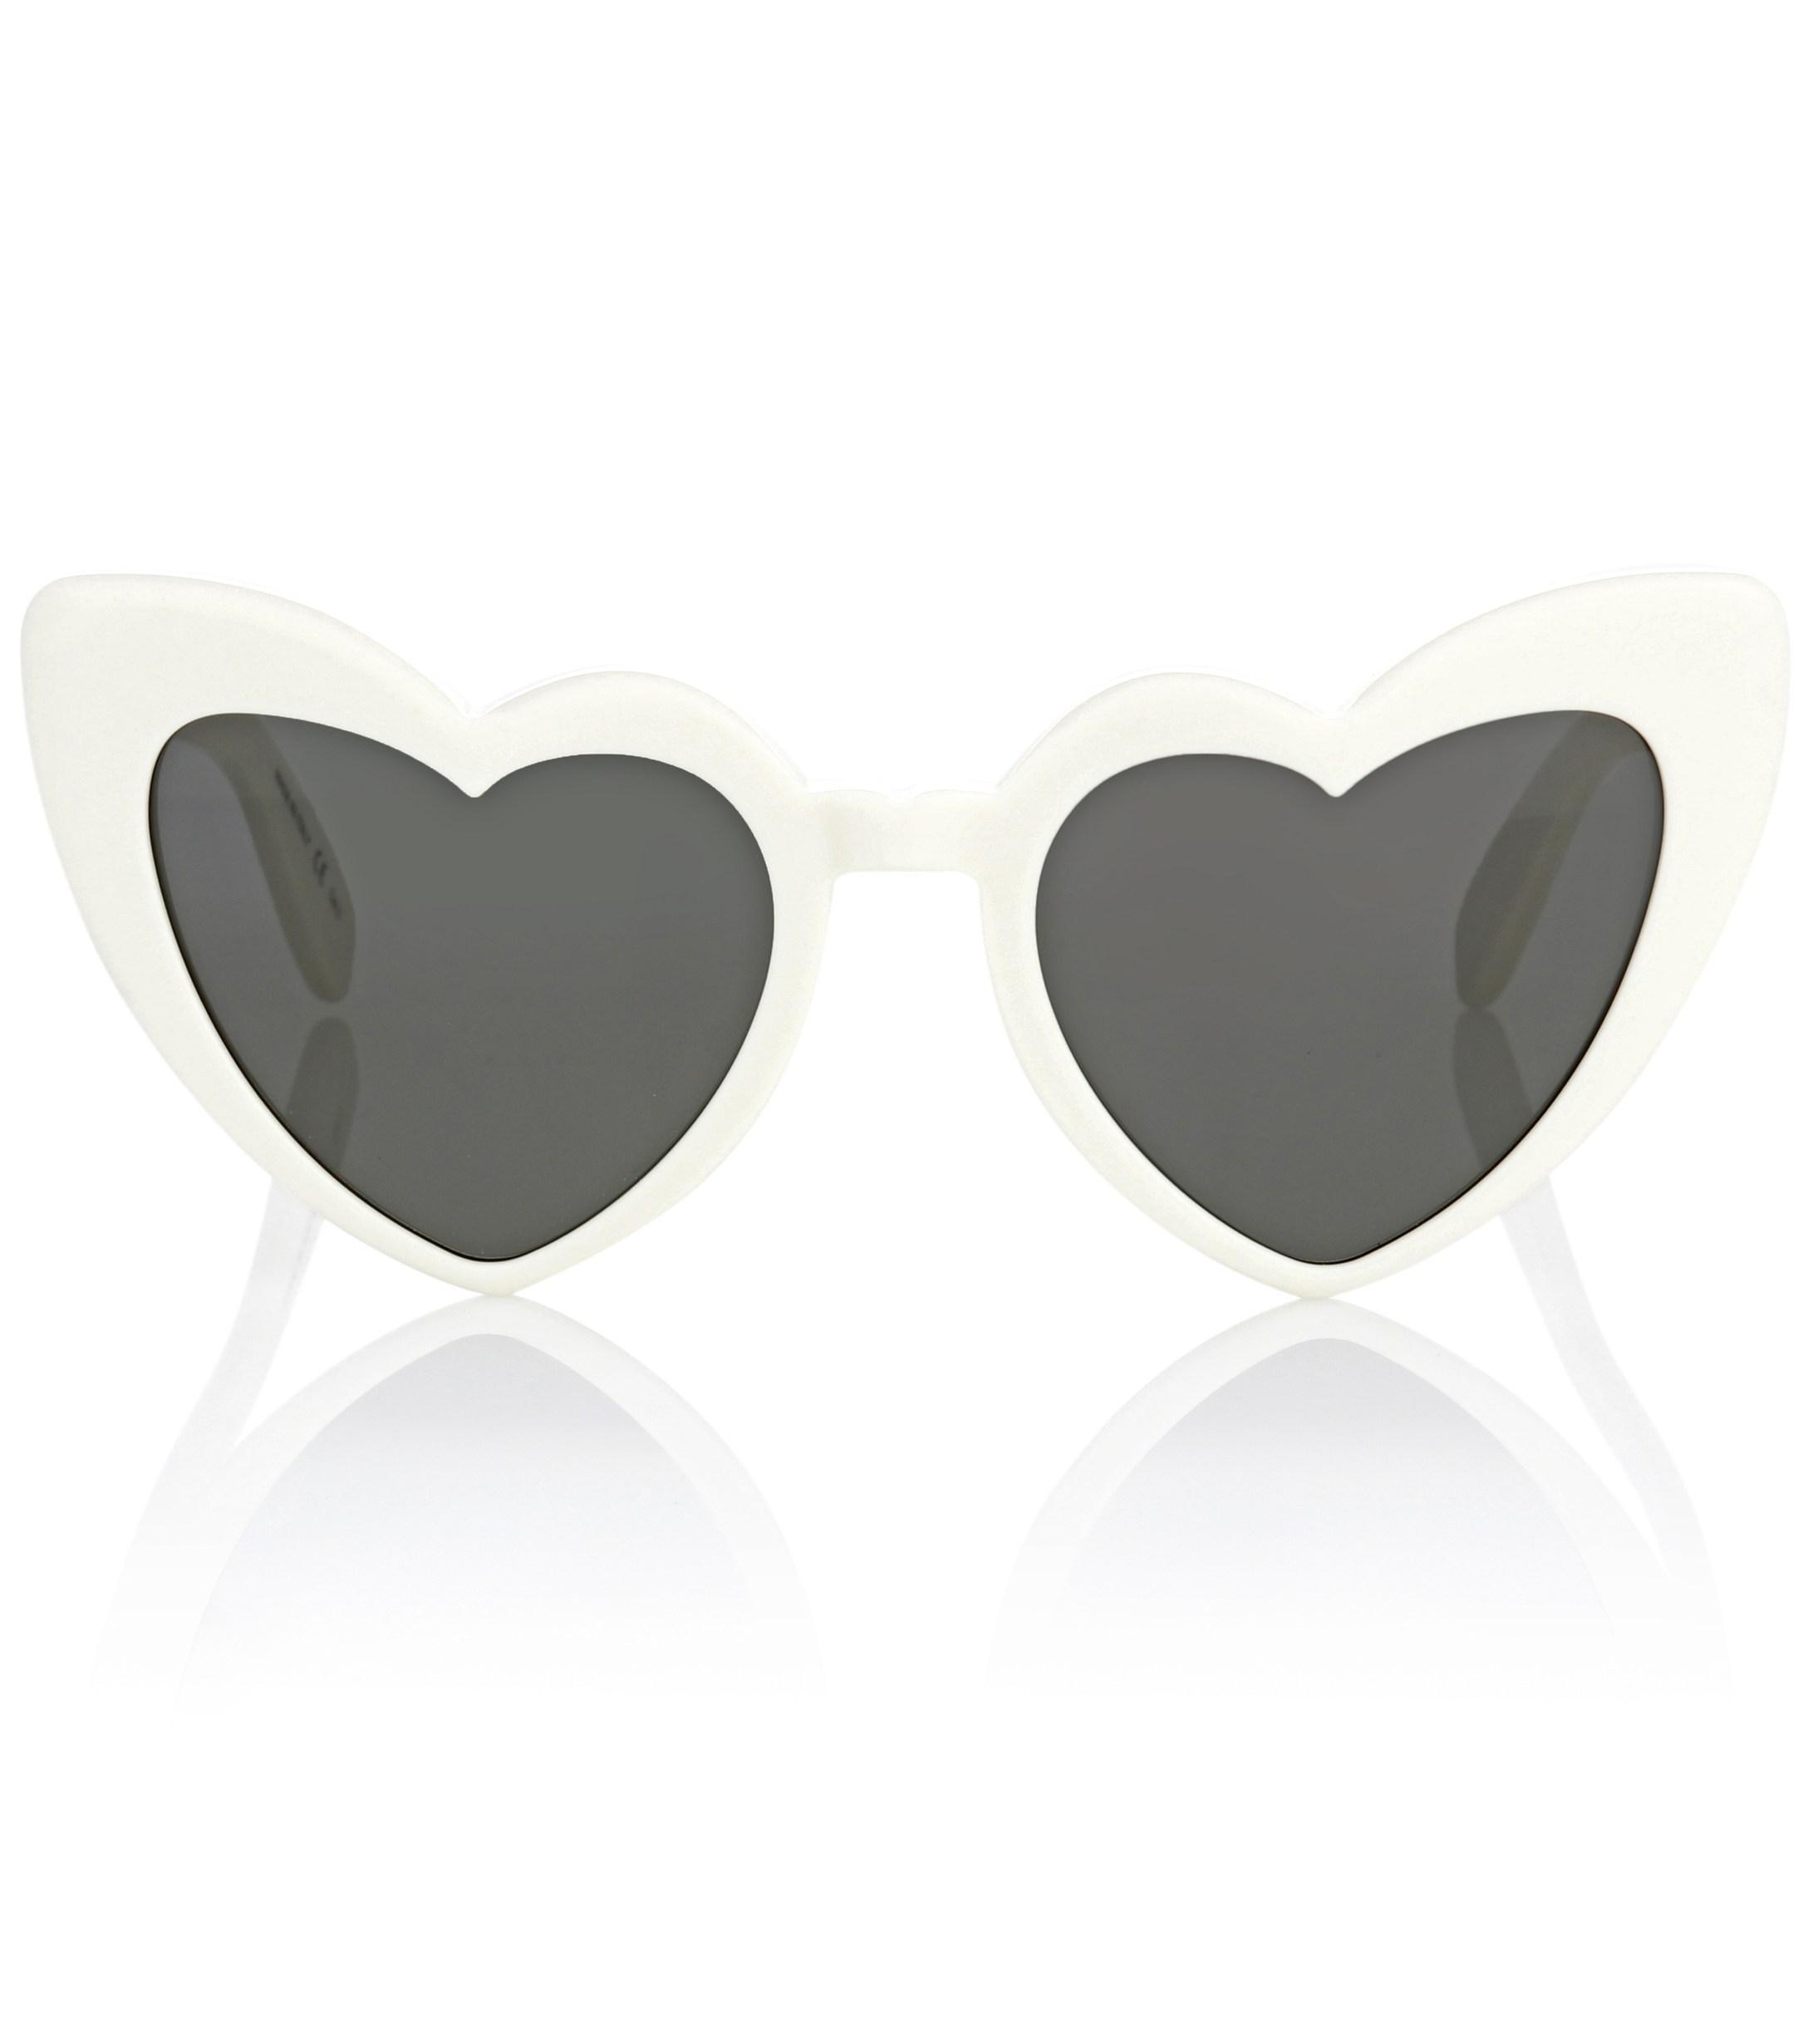 00bb150e3c Saint Laurent Heart-shaped Sunglasses in White - Lyst